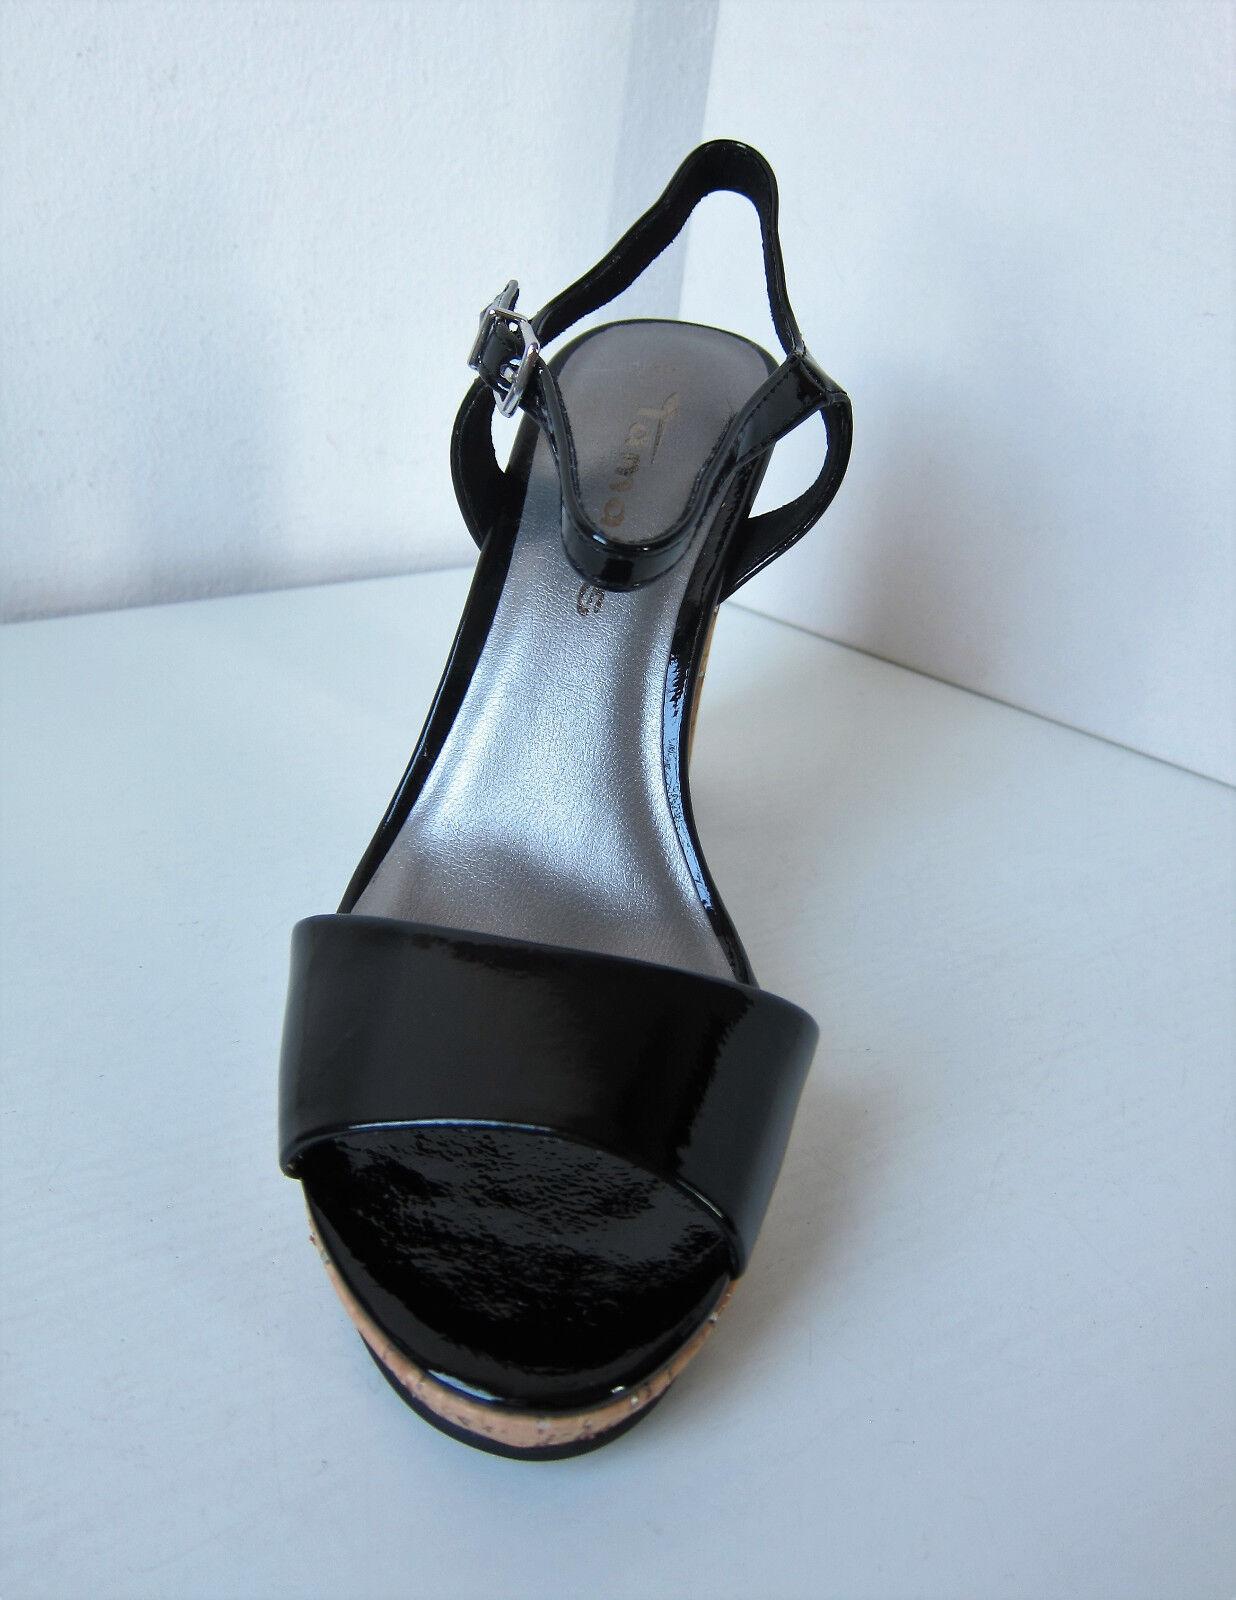 Tamaris Sandale Lack Riemchen Pumps schwarz Gr 36 Sandale Tamaris Pumps Sandalette Patent Myggia 1d86ca